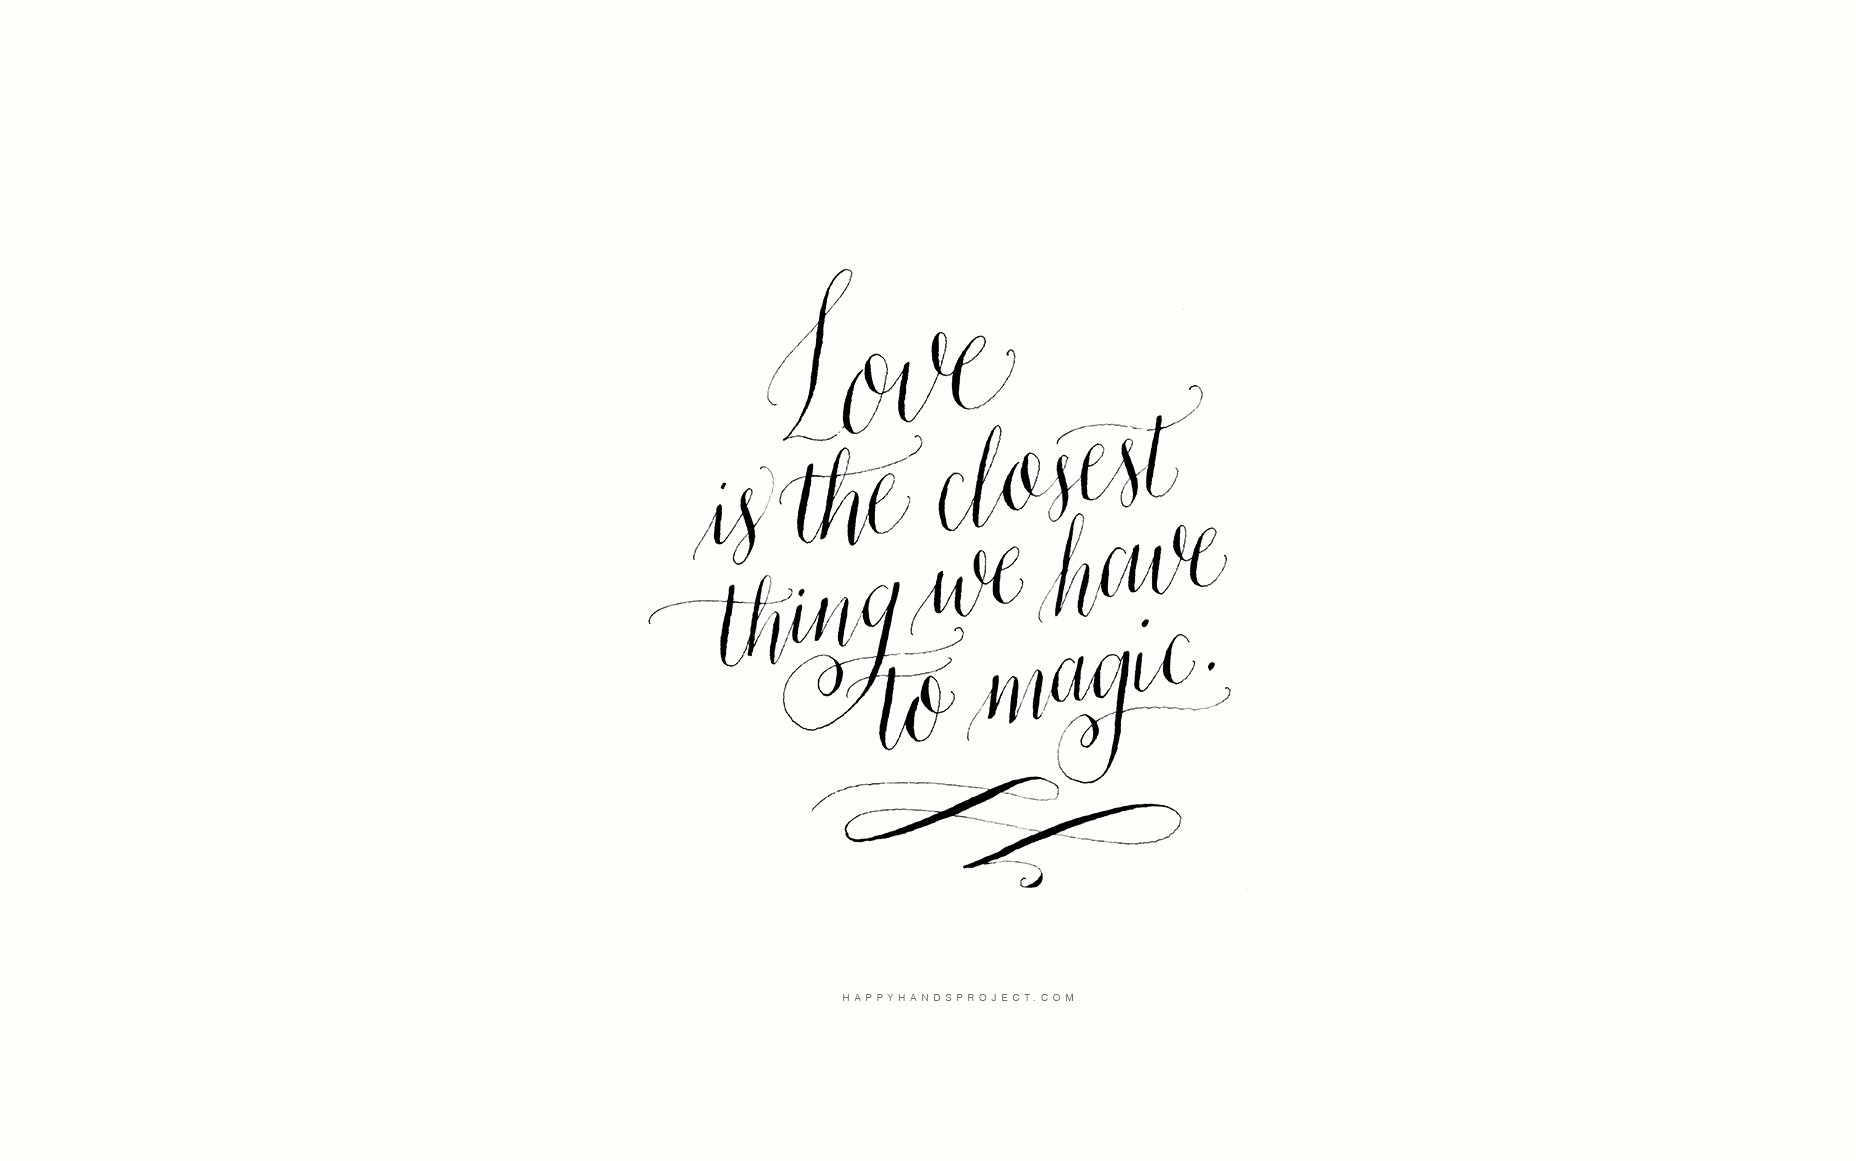 Calligraphy love quotes quotesgram